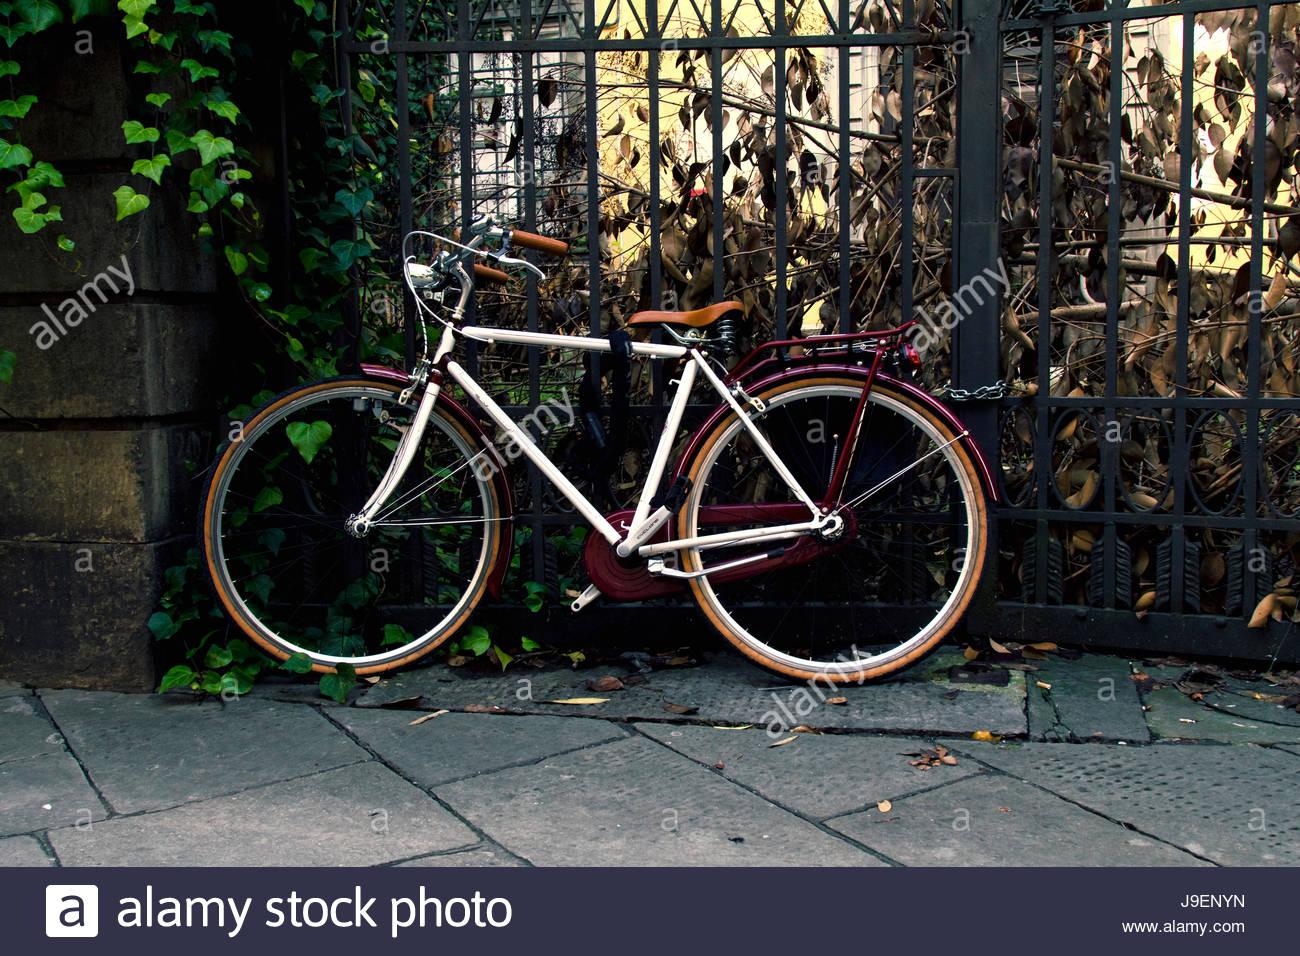 Bicicletas antiguas en Italia (Toscana) - Stock Image